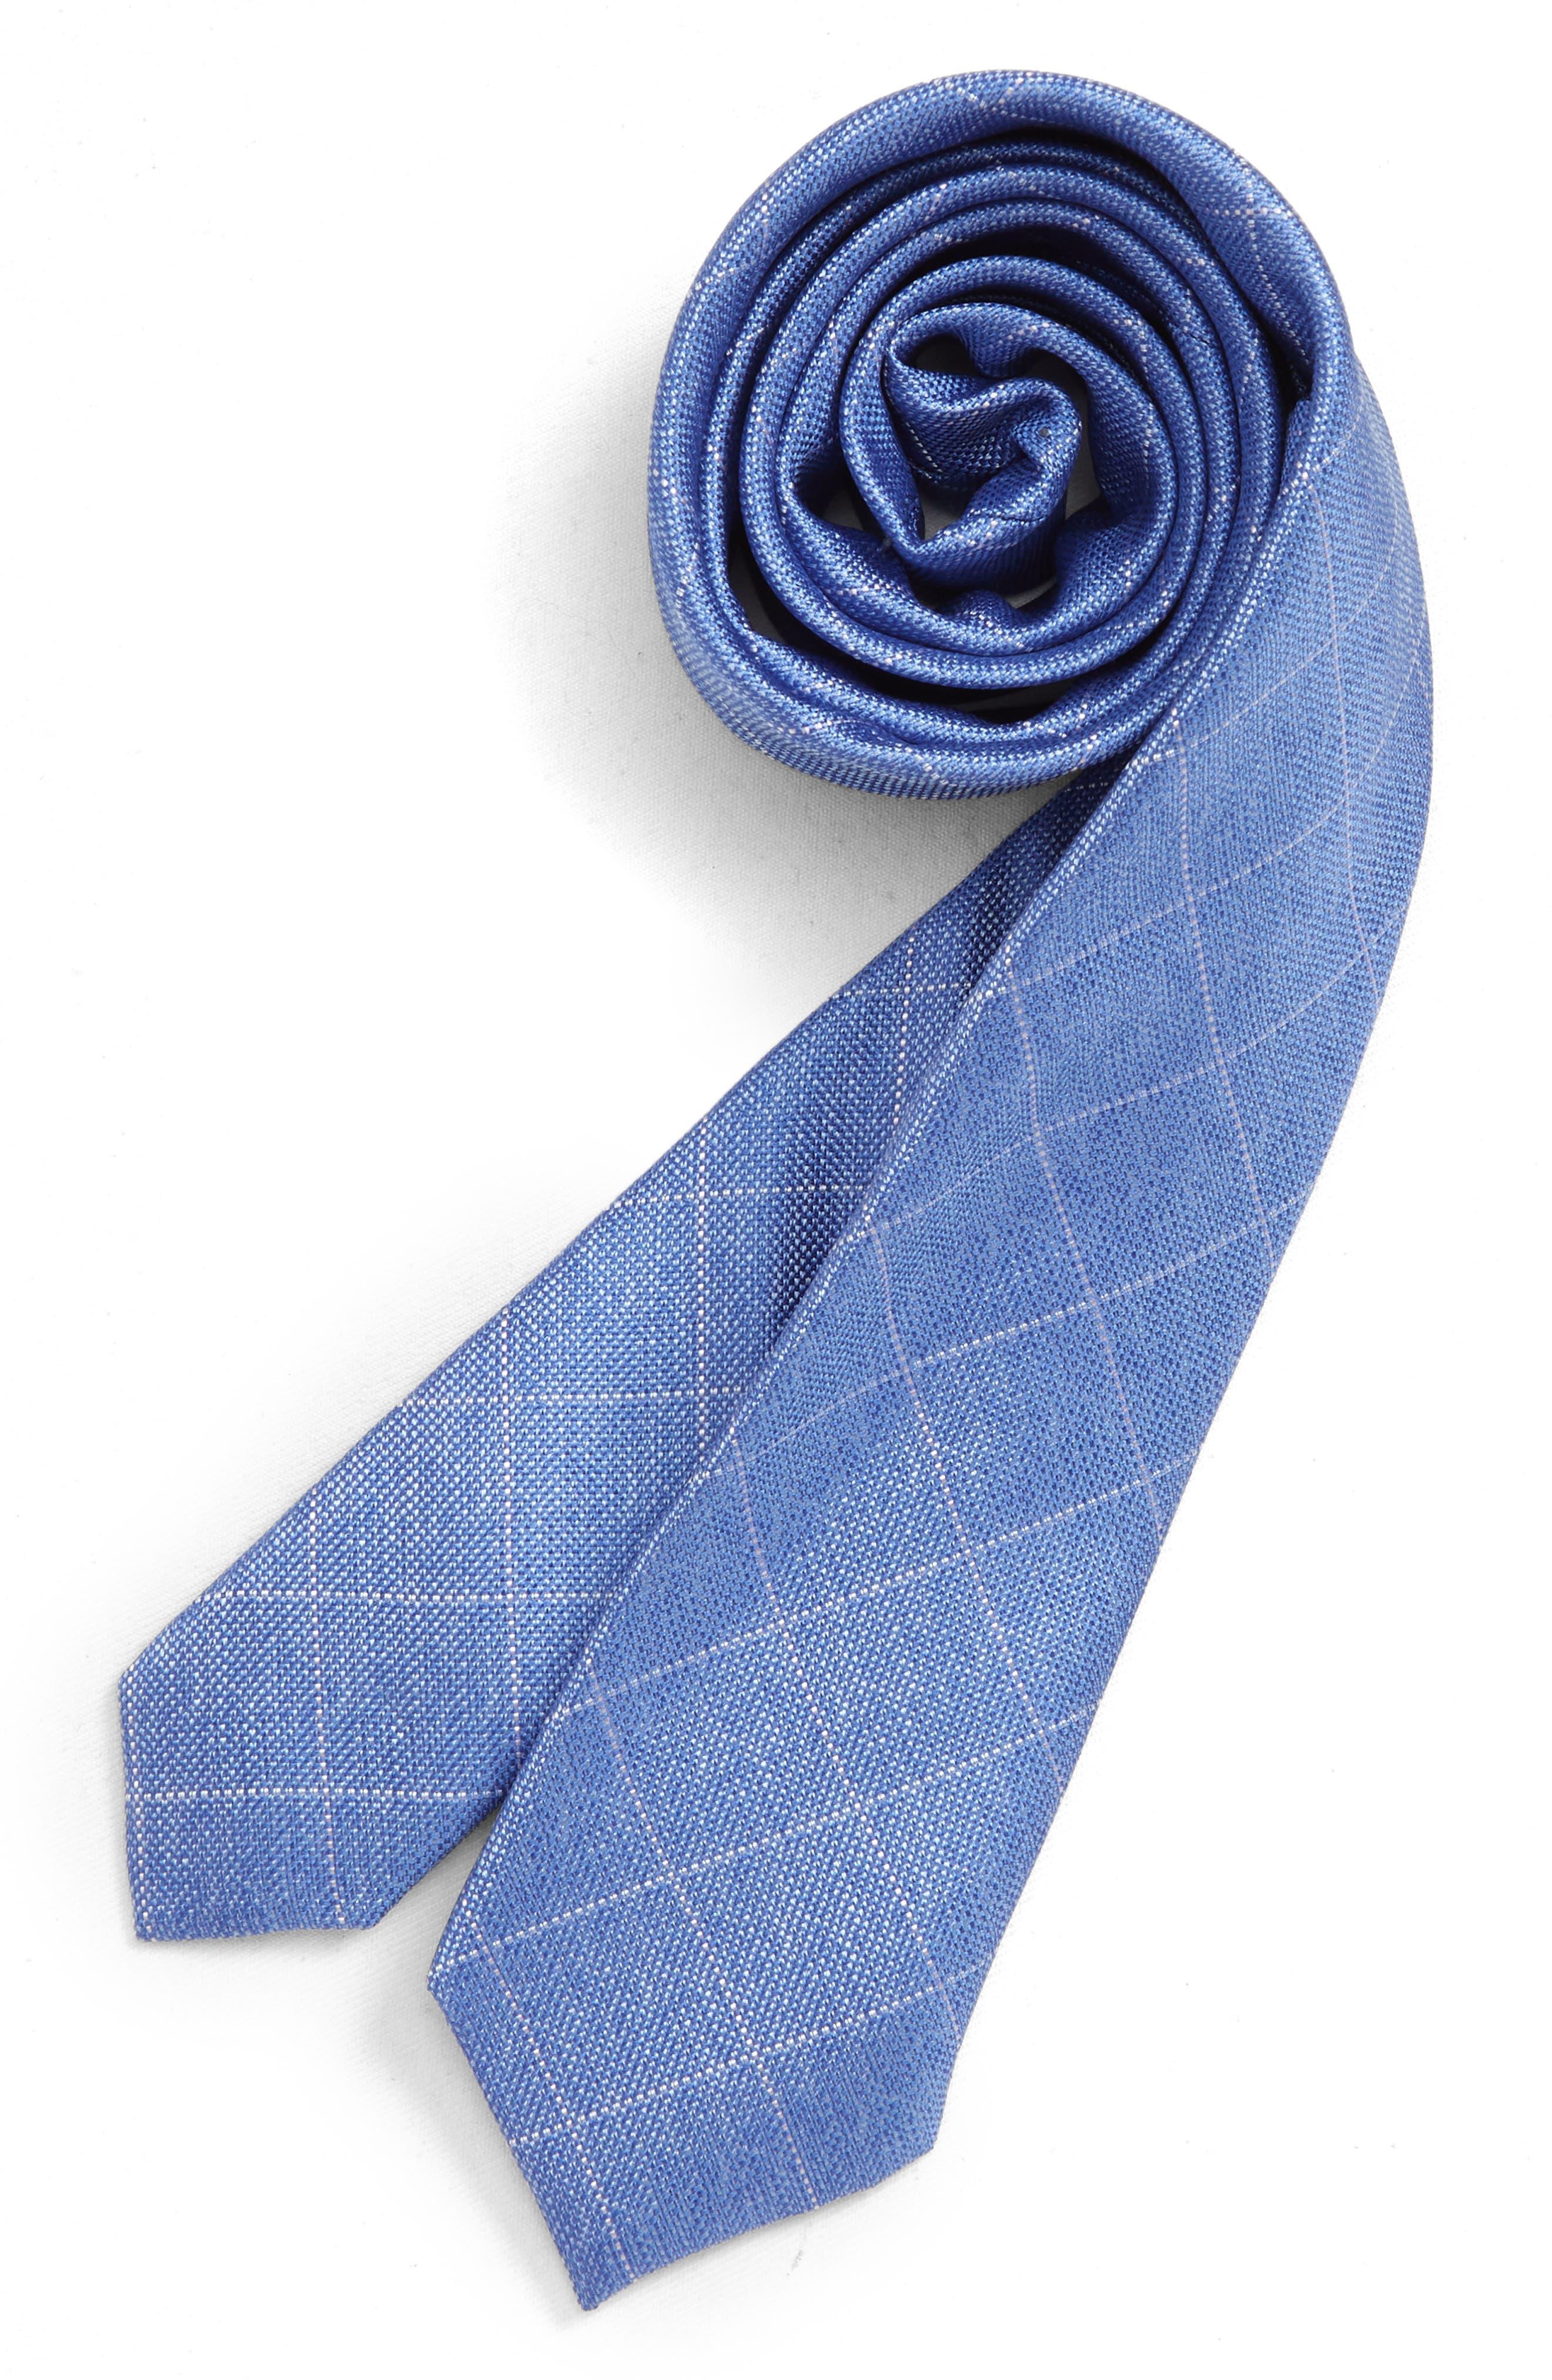 NORDSTROM, Isaiah Grid Silk Tie, Main thumbnail 1, color, BLUE